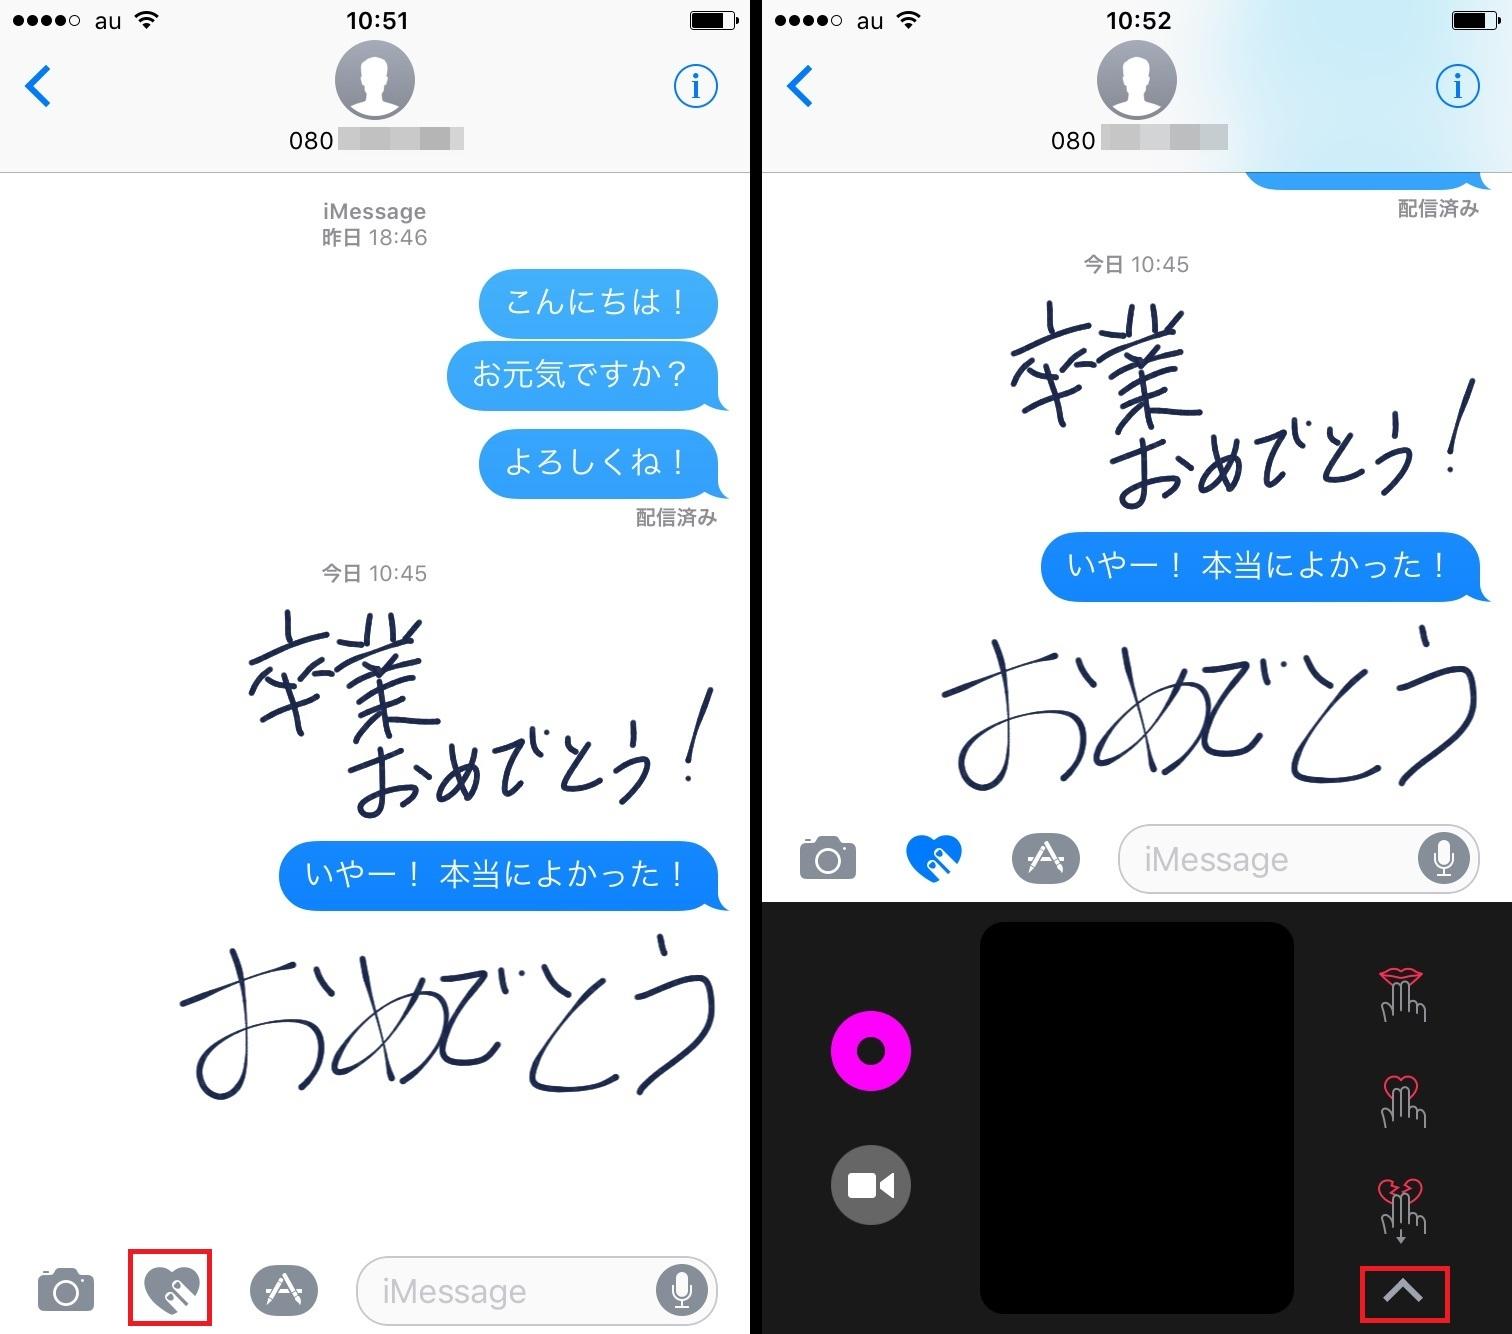 Iphone 7を買ったら試したい直筆やイラストでアレンジしたメッセージを